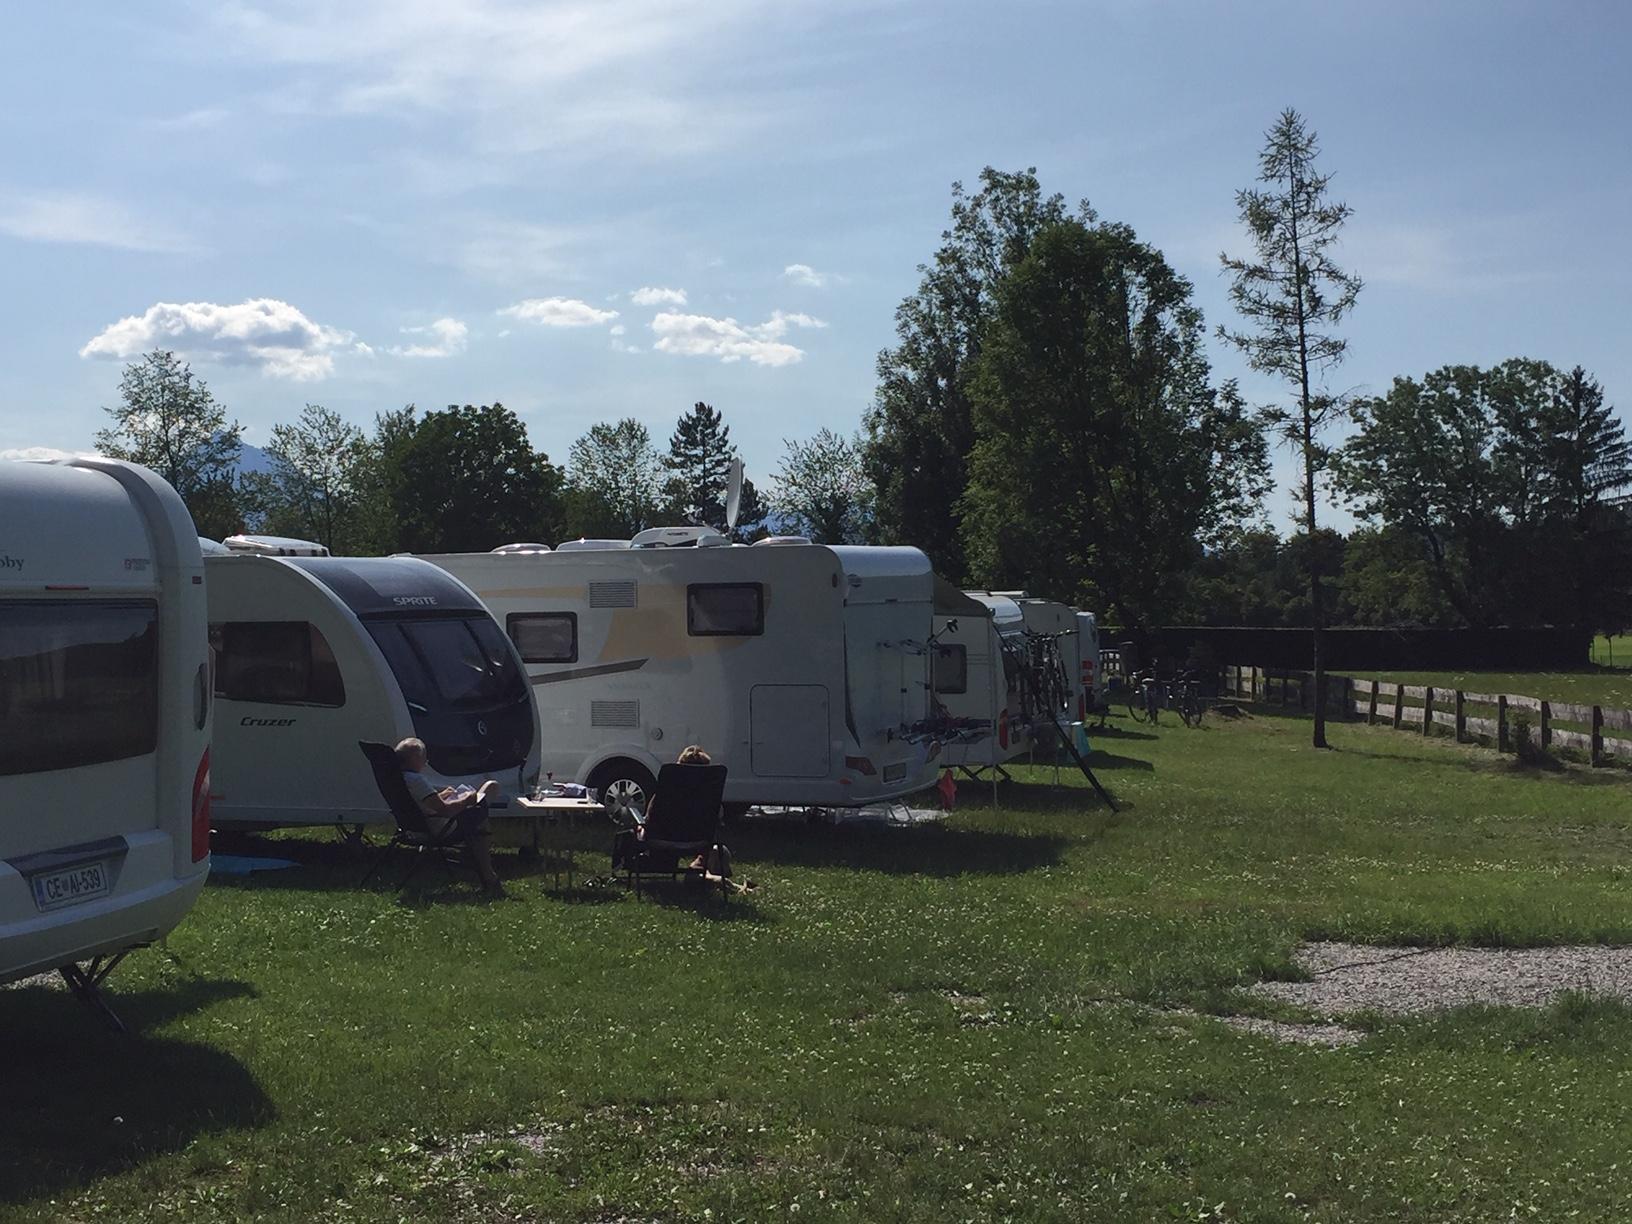 Campen in idyllischer Umgebung